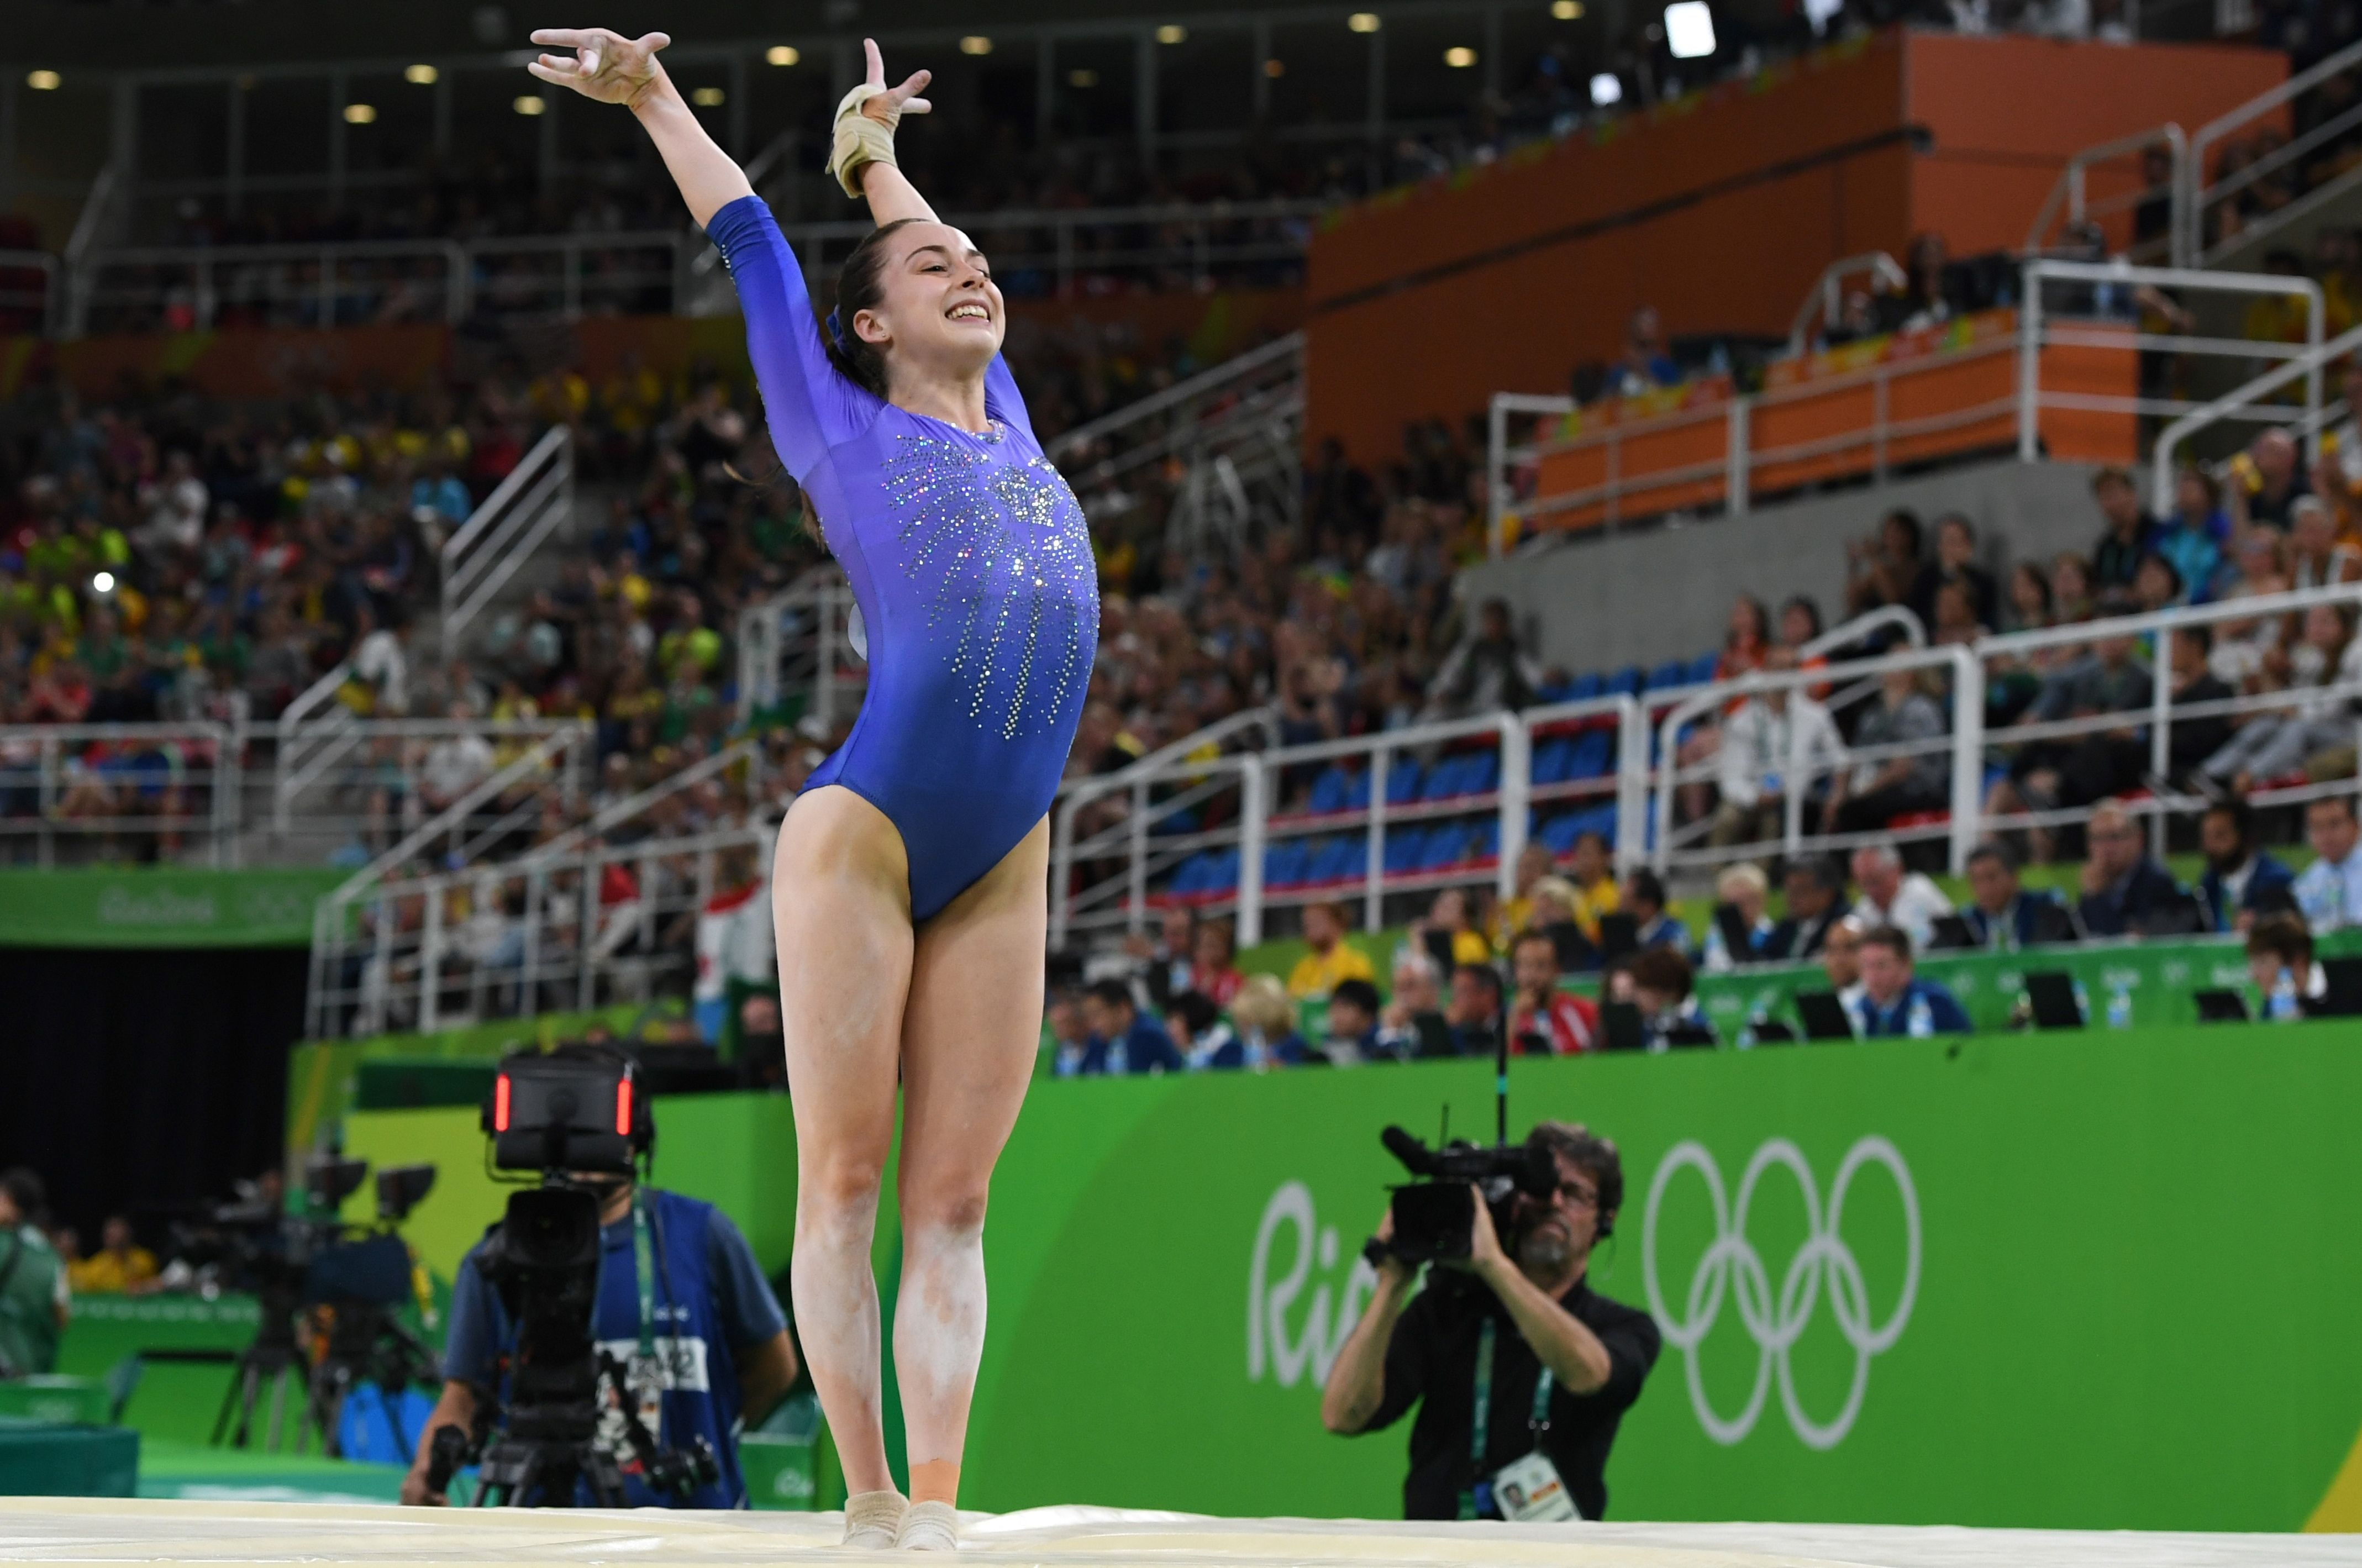 Canadian female gymnast Isabela Onyshko lands after her